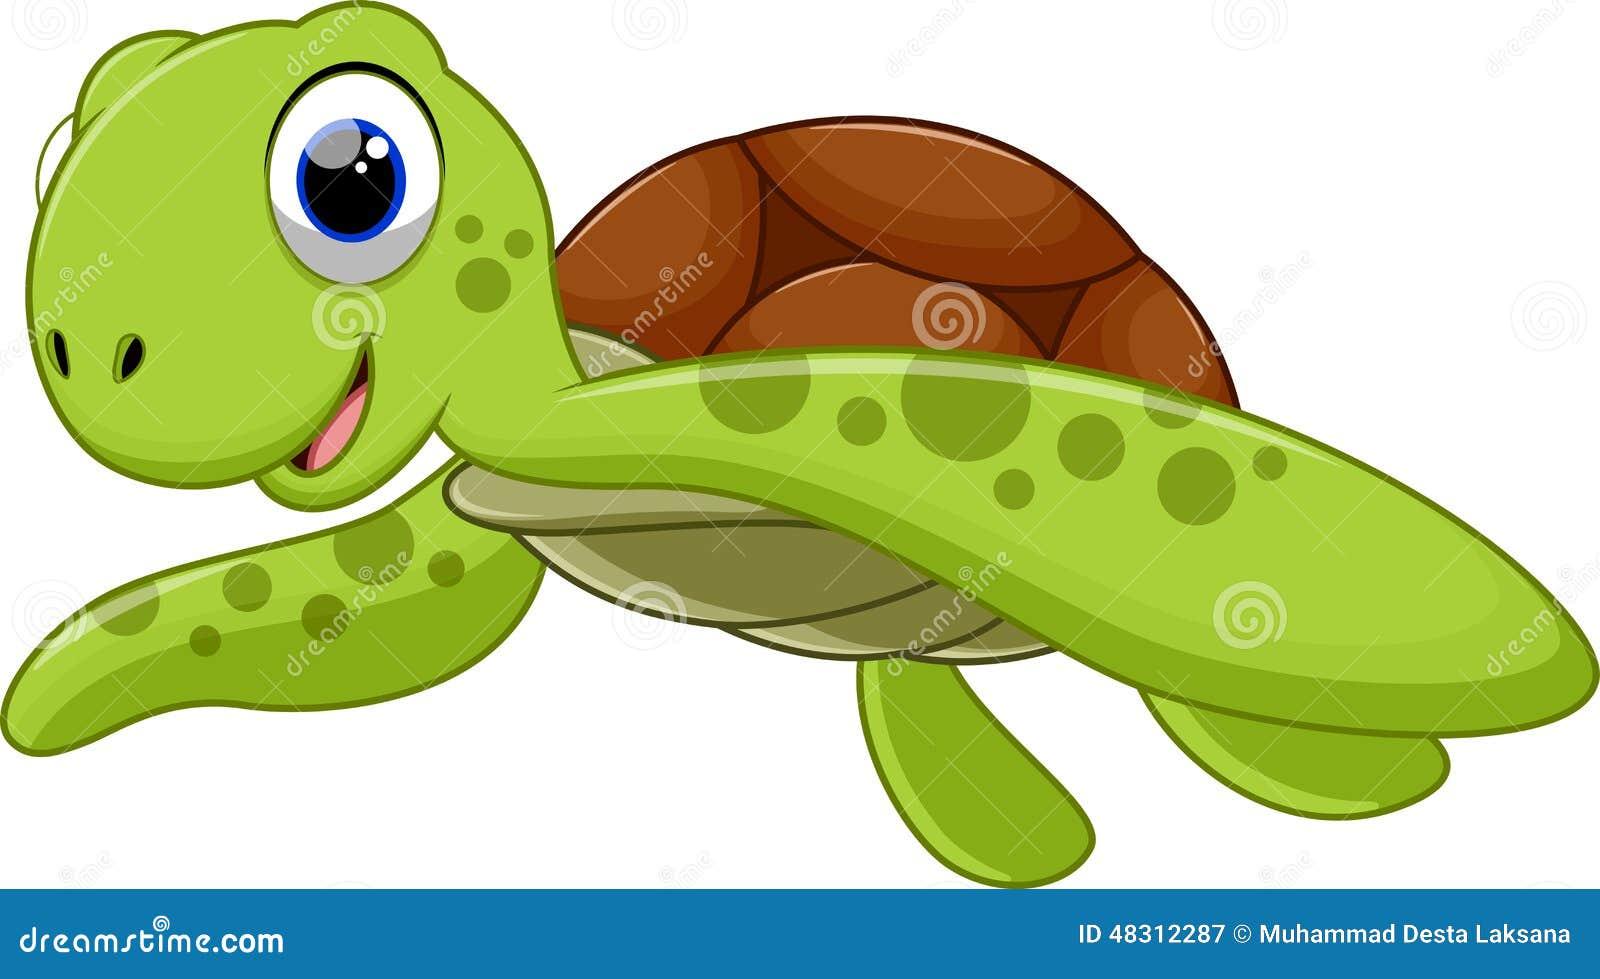 Cute animated sea turtles - photo#19